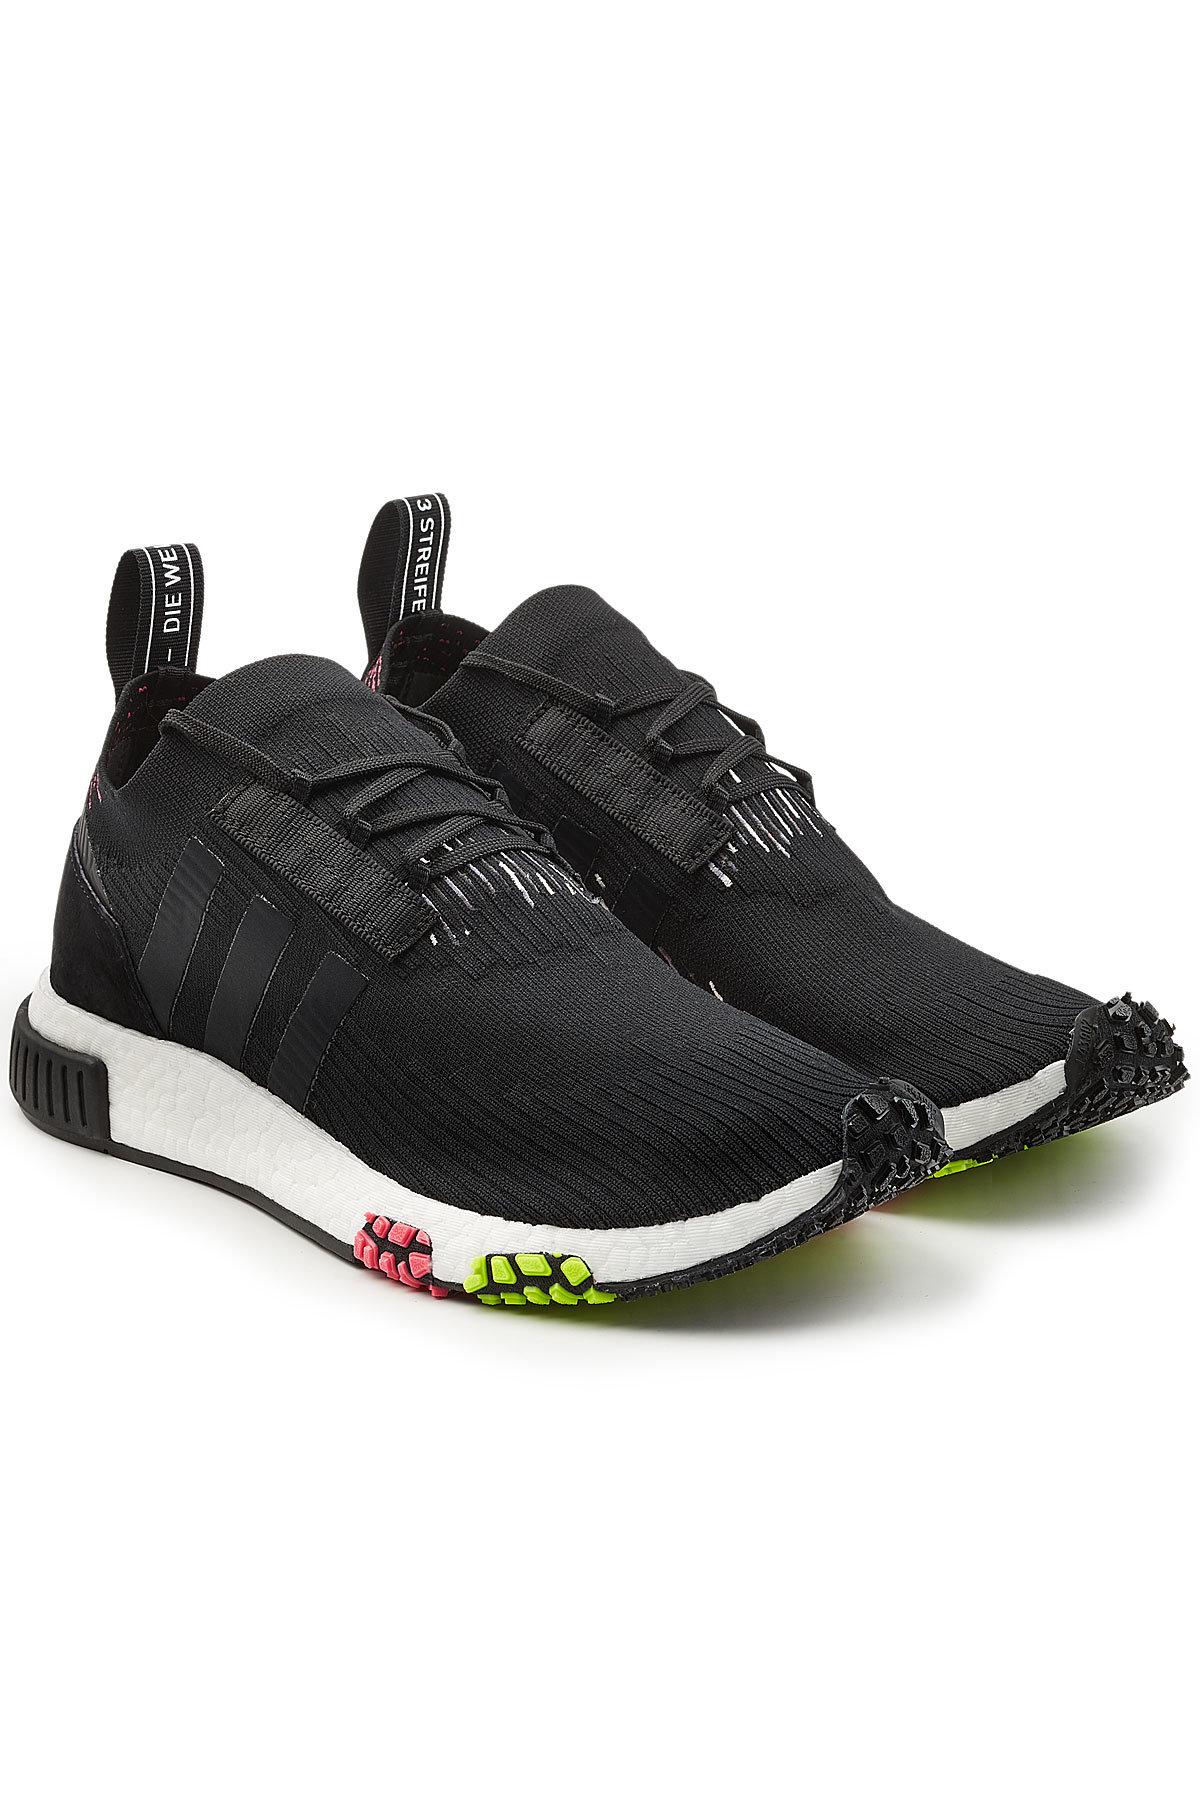 adidas NMD Racer Primeknit Sneakers Gr. UK 5 zoKJB